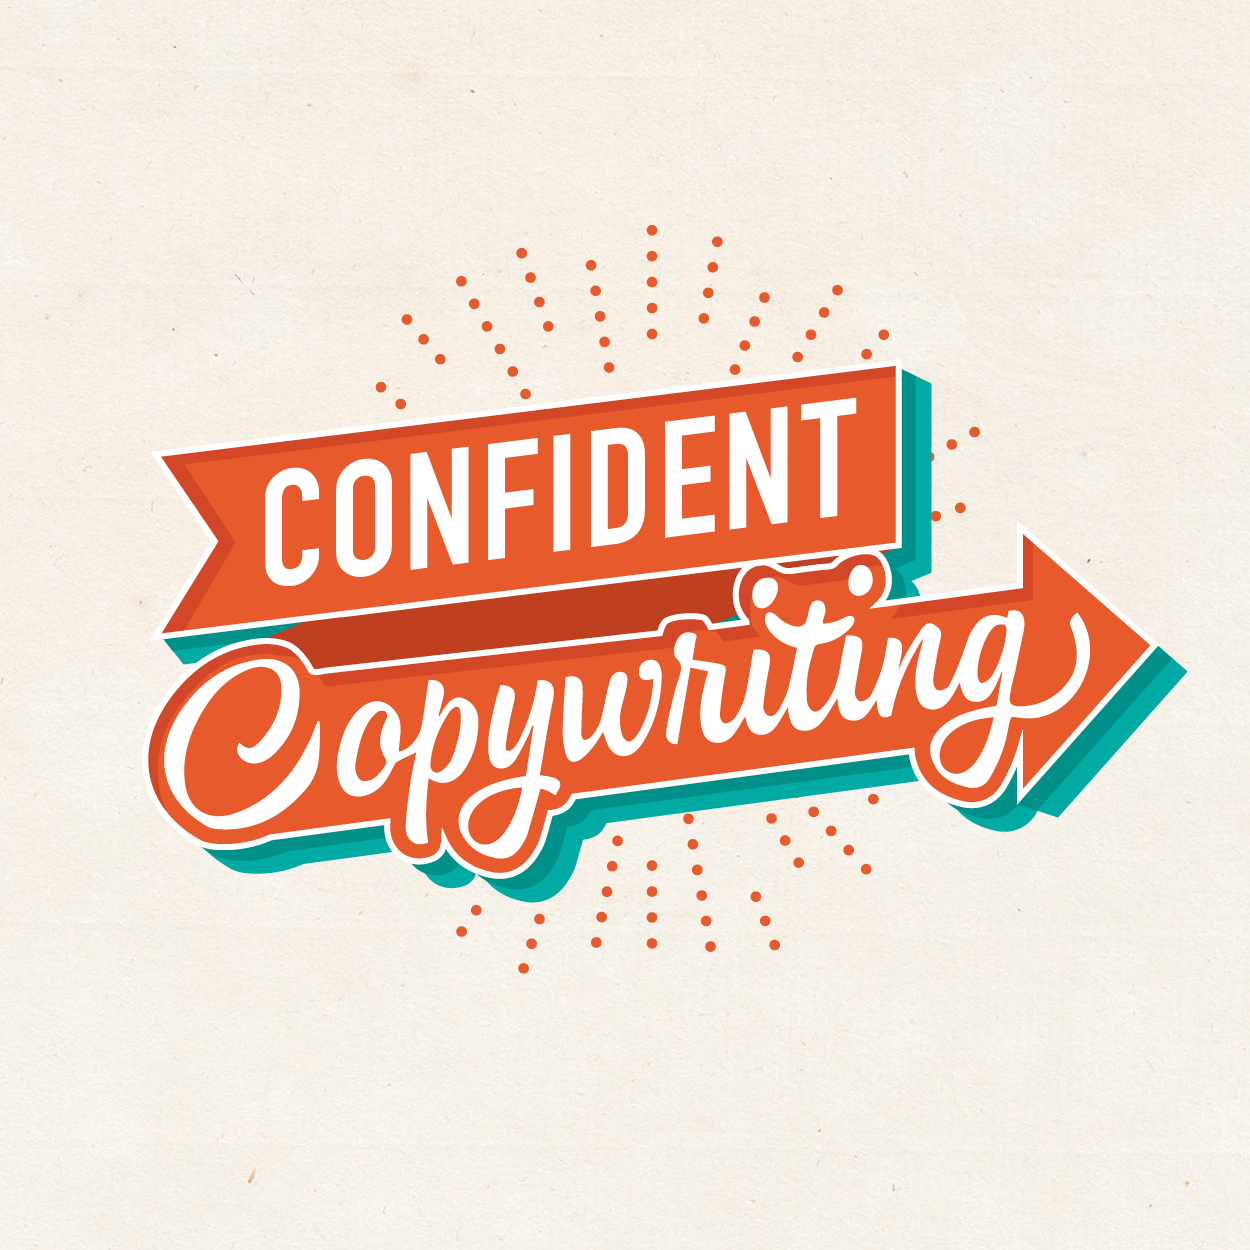 BRANDING - CONFIDENT COPYWRITING